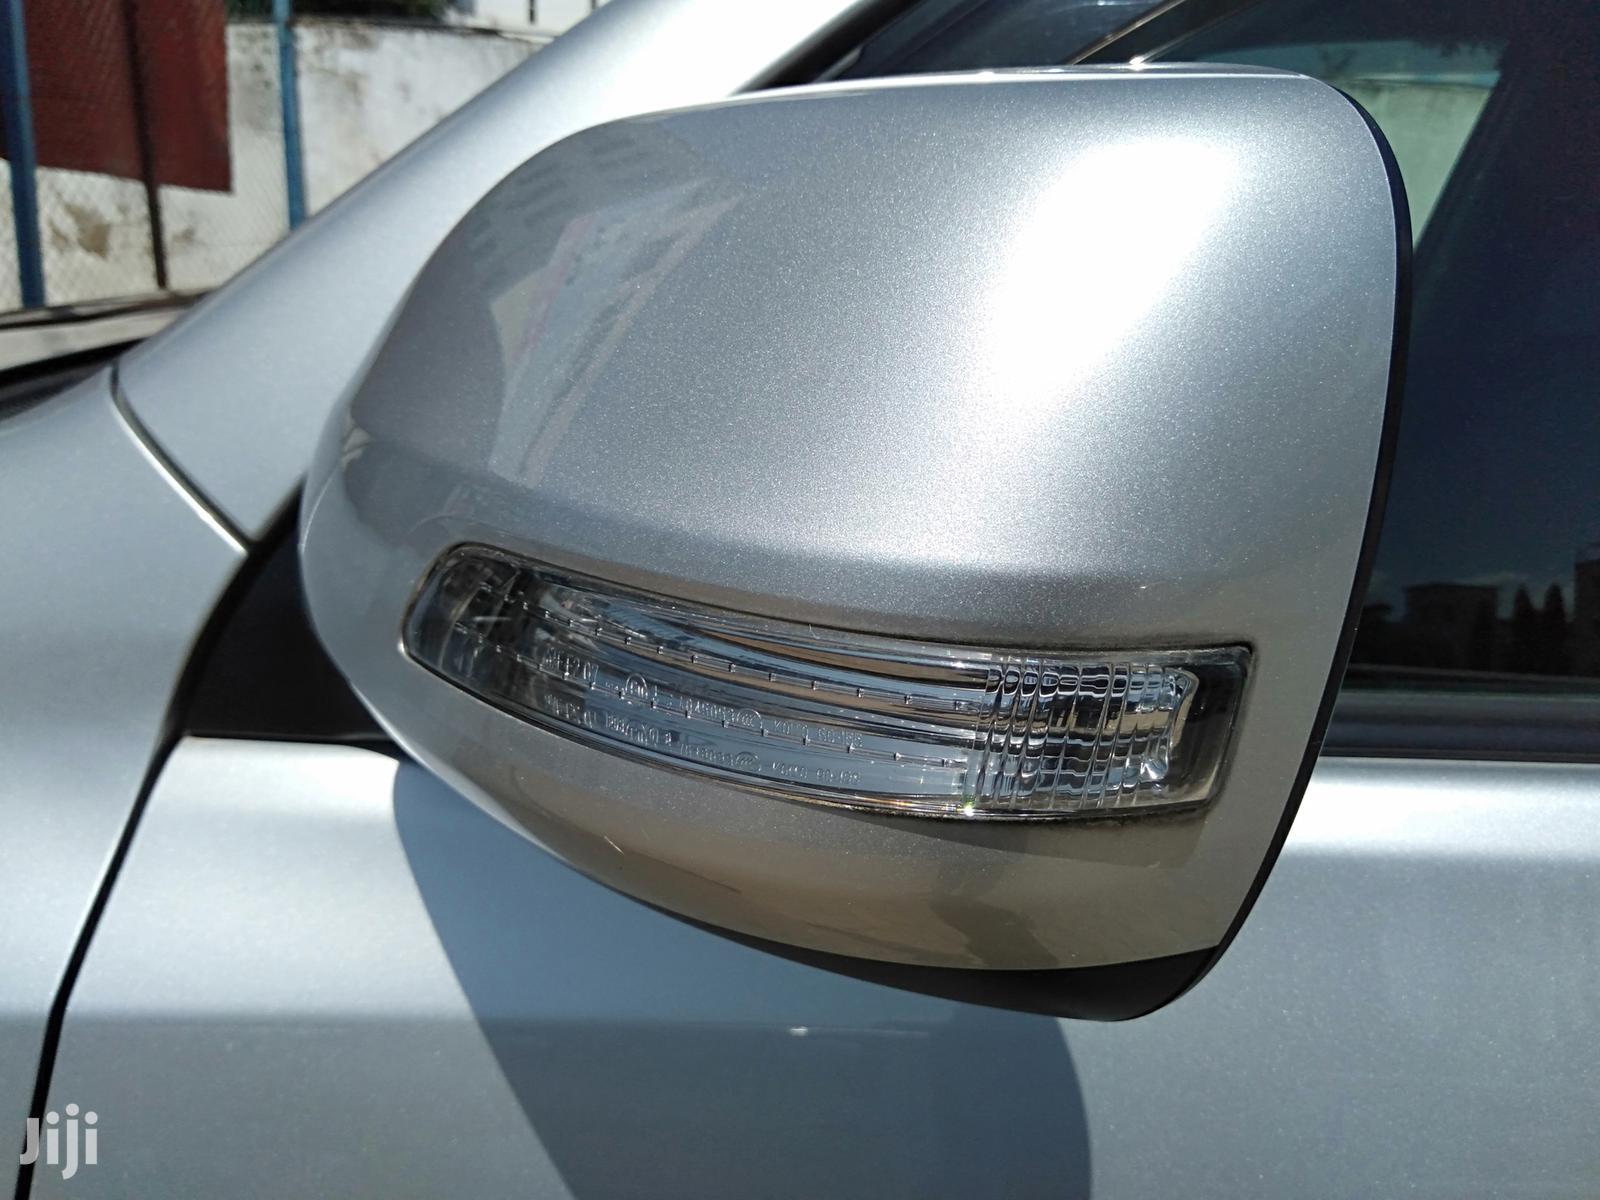 Toyota Land Cruiser Prado 2012 Silver   Cars for sale in Mvita, Mombasa, Kenya